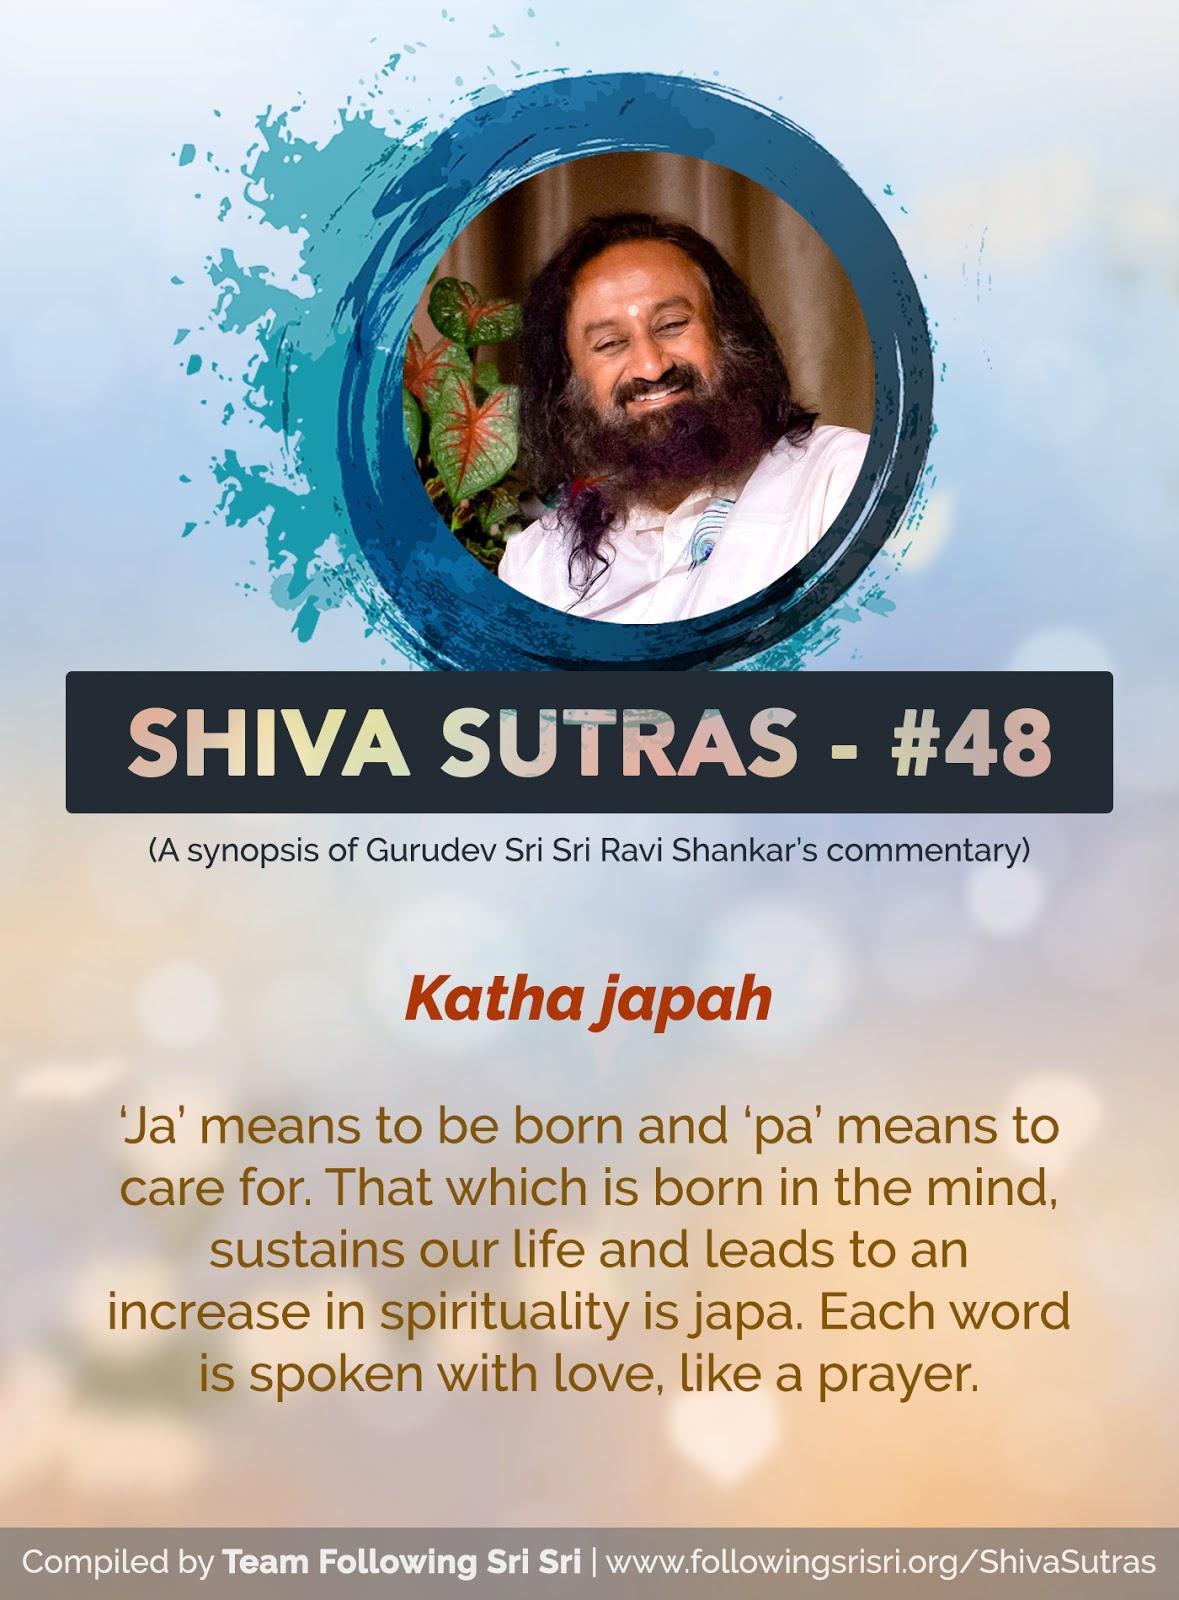 Shiva Sutras - Sutra 48